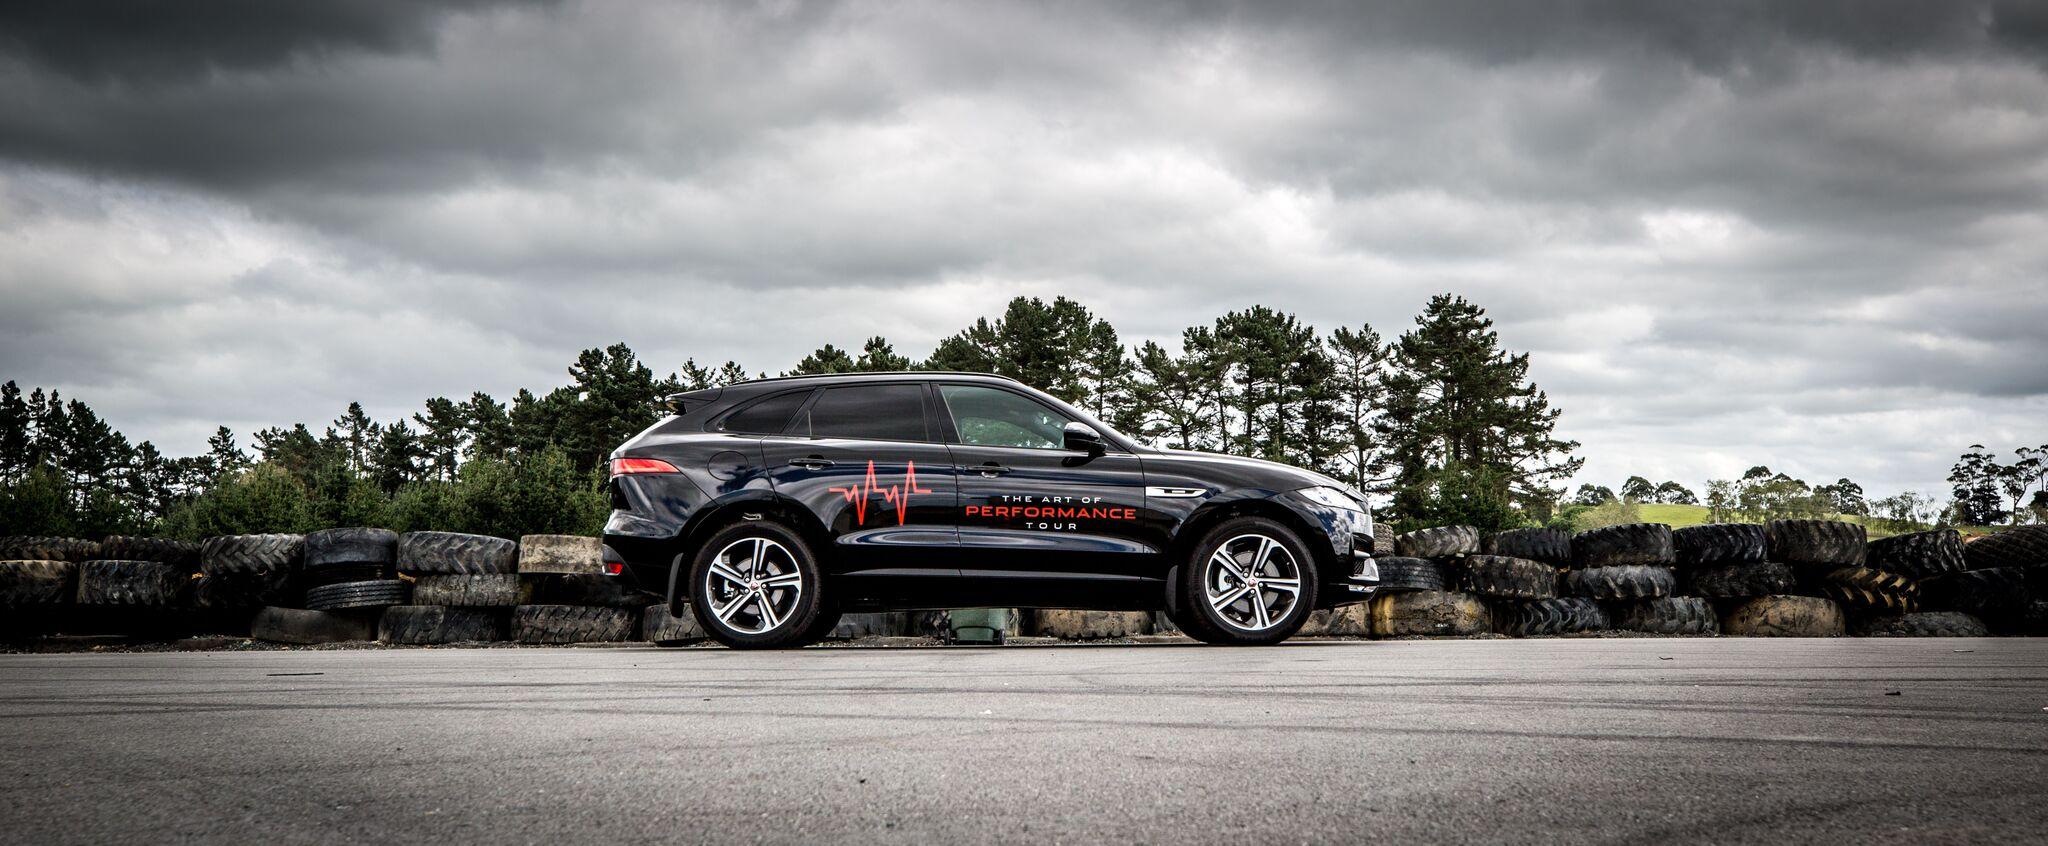 Jaguar - Art of Performance - WED AFTERNOON 2MB-139_preview.jpeg